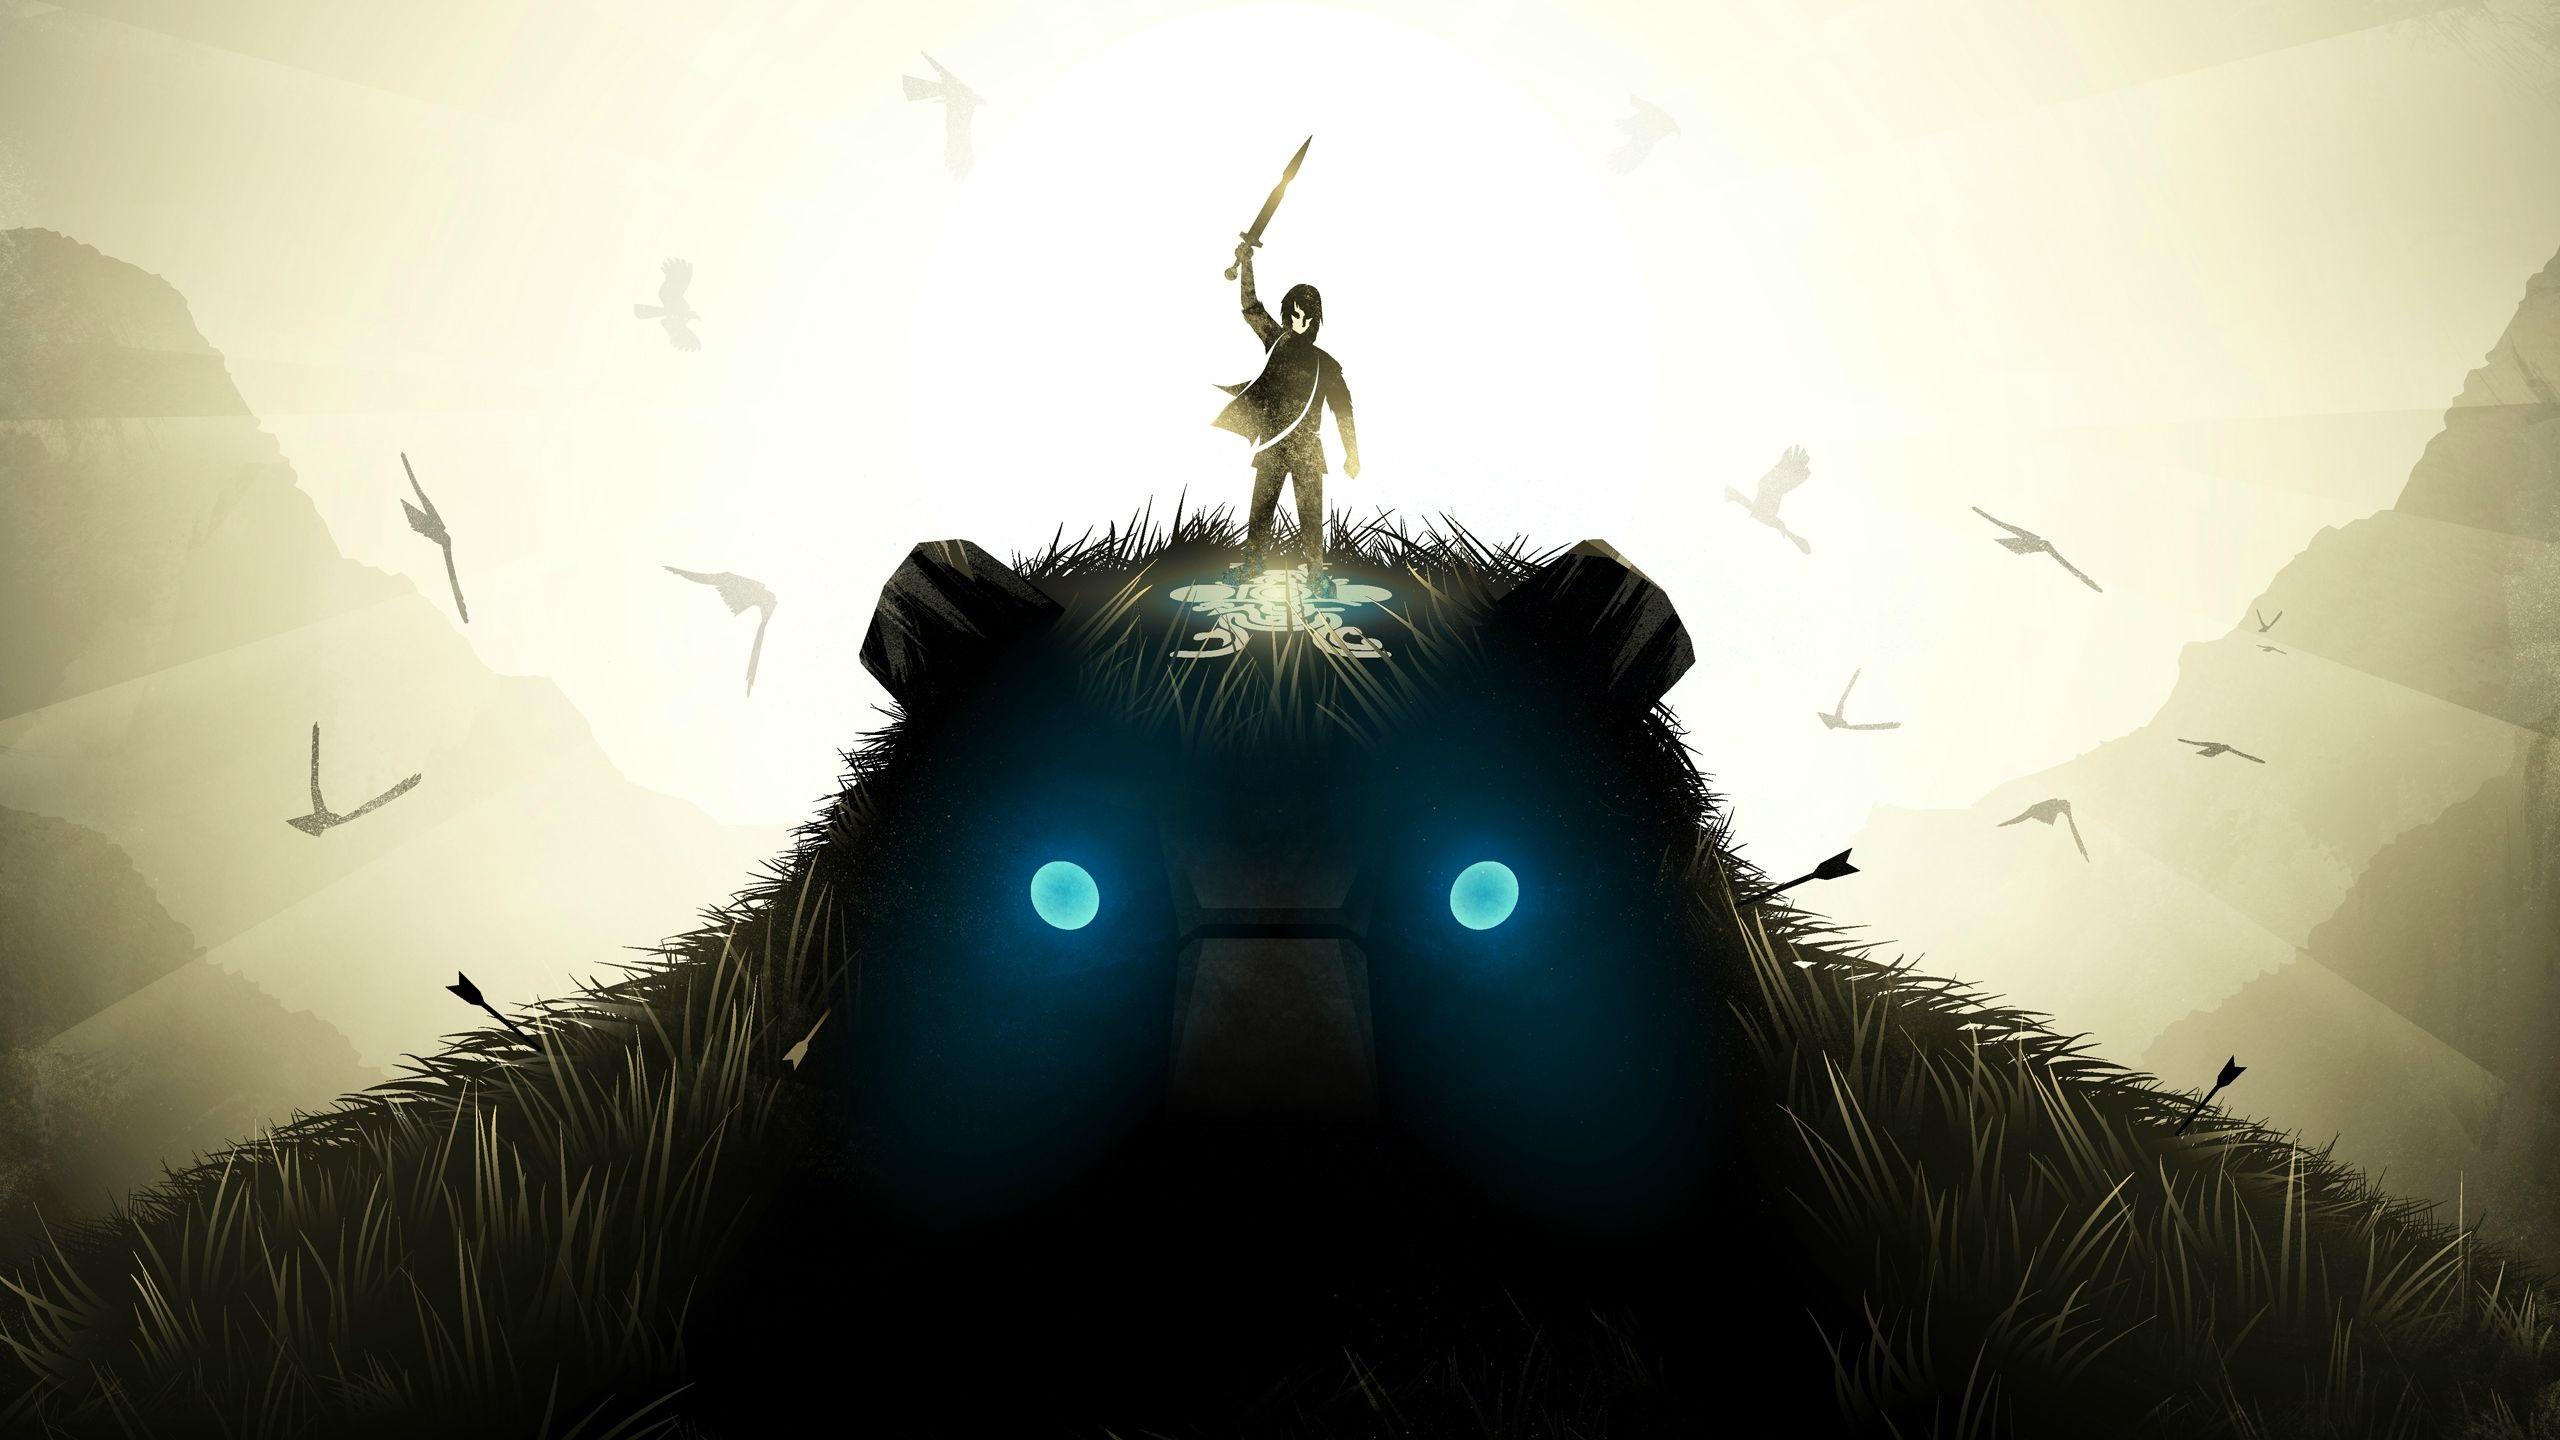 Wallpaper Shadow of the Colossus, PC game 2560x1440 QHD